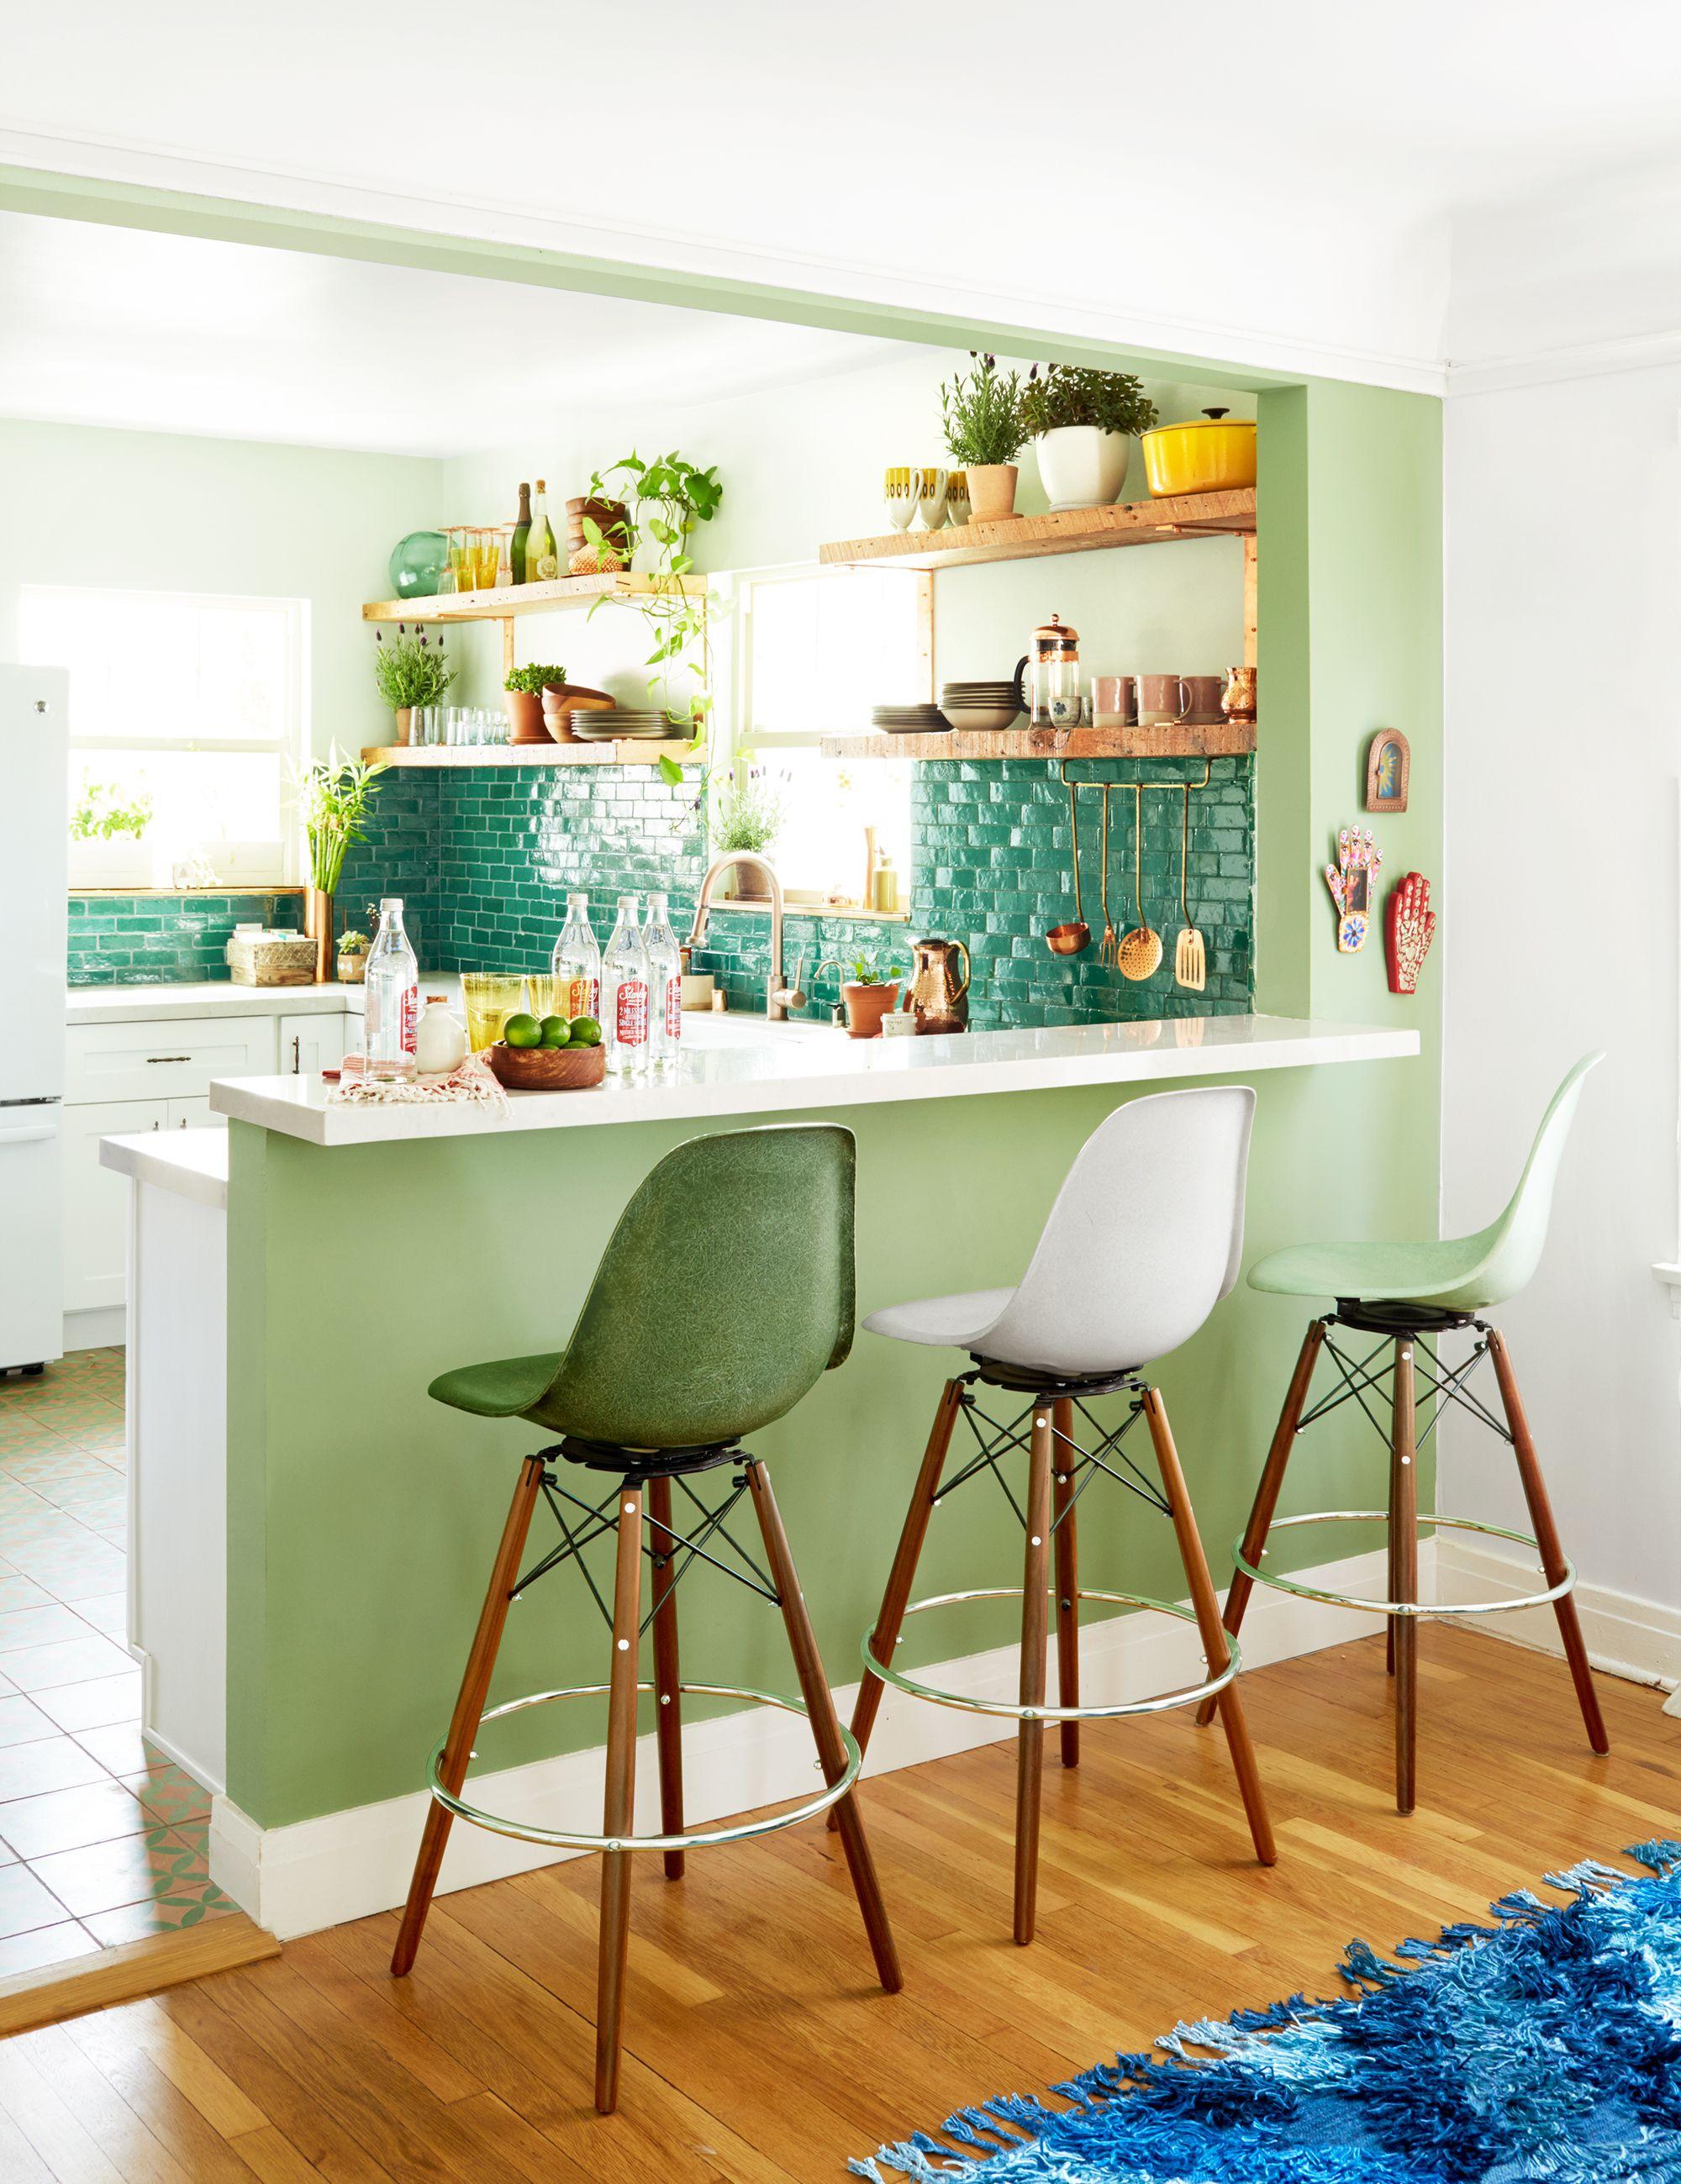 12 Best Kitchen Backsplash Ideas - Tile Designs for Kitchen